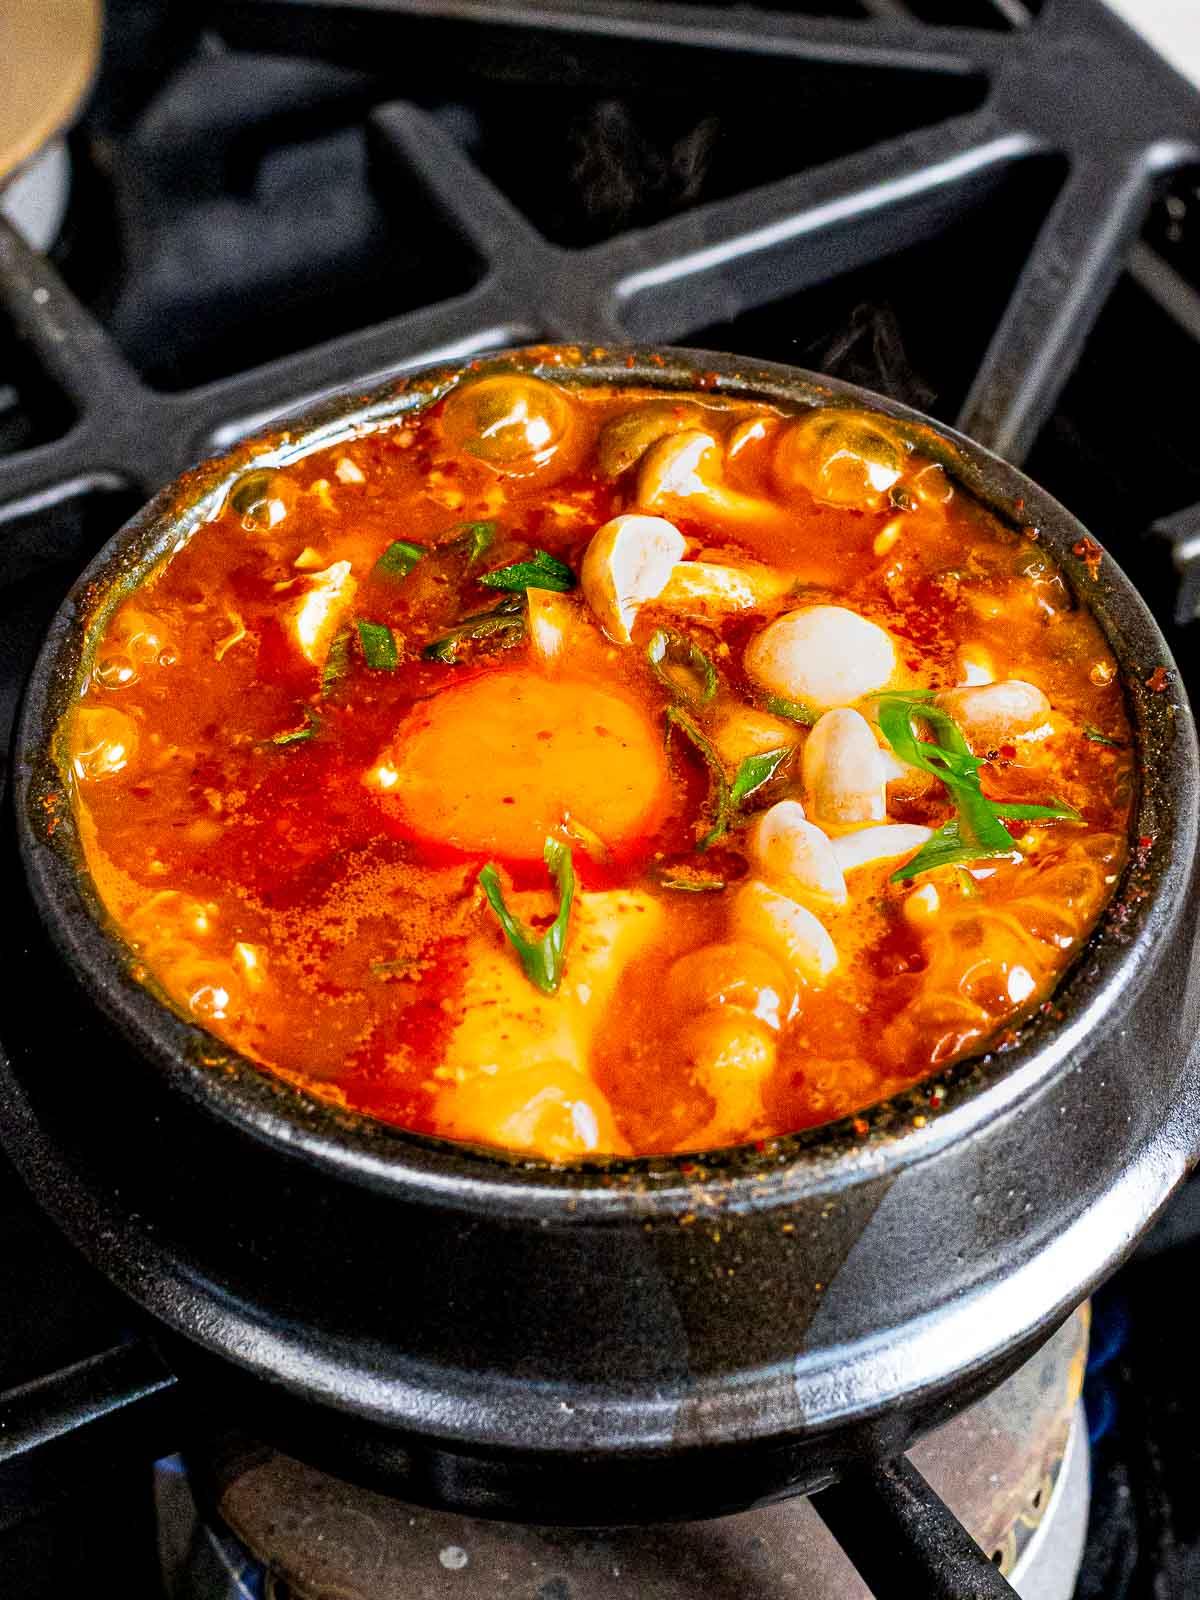 Korean tofu soup or soondubu jiggae with mushrooms and egg in an earthenware pot.